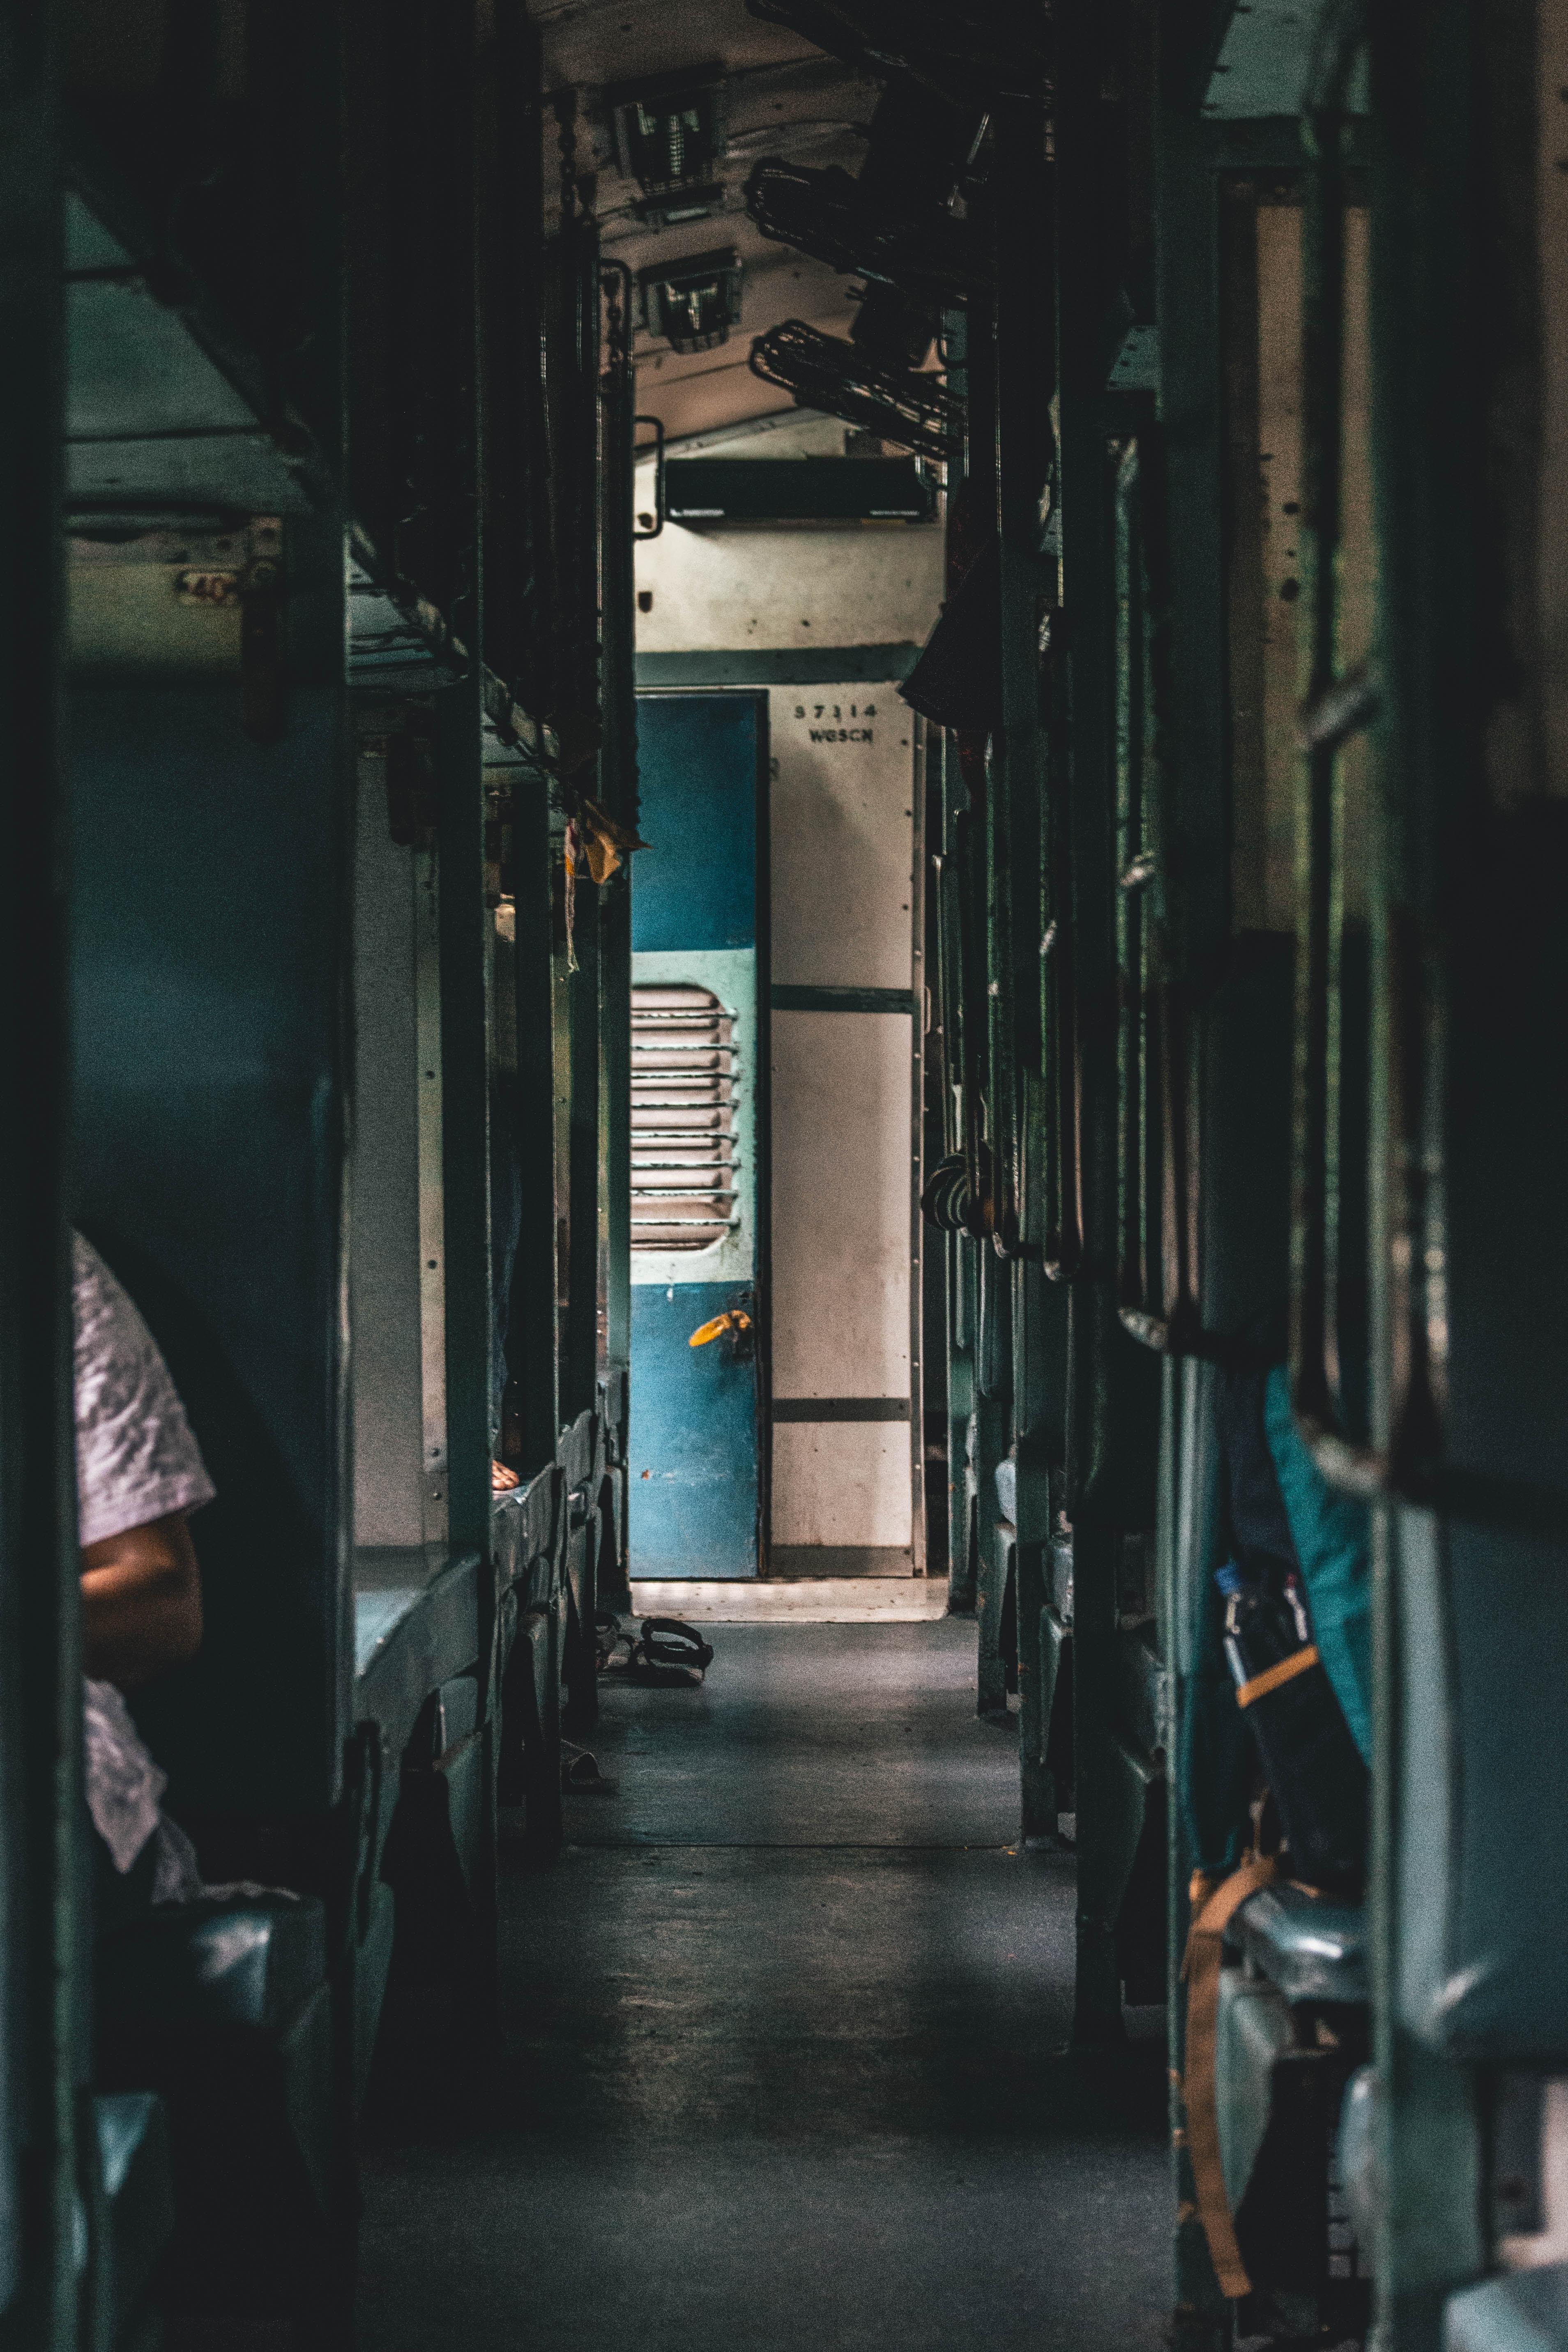 train chairs